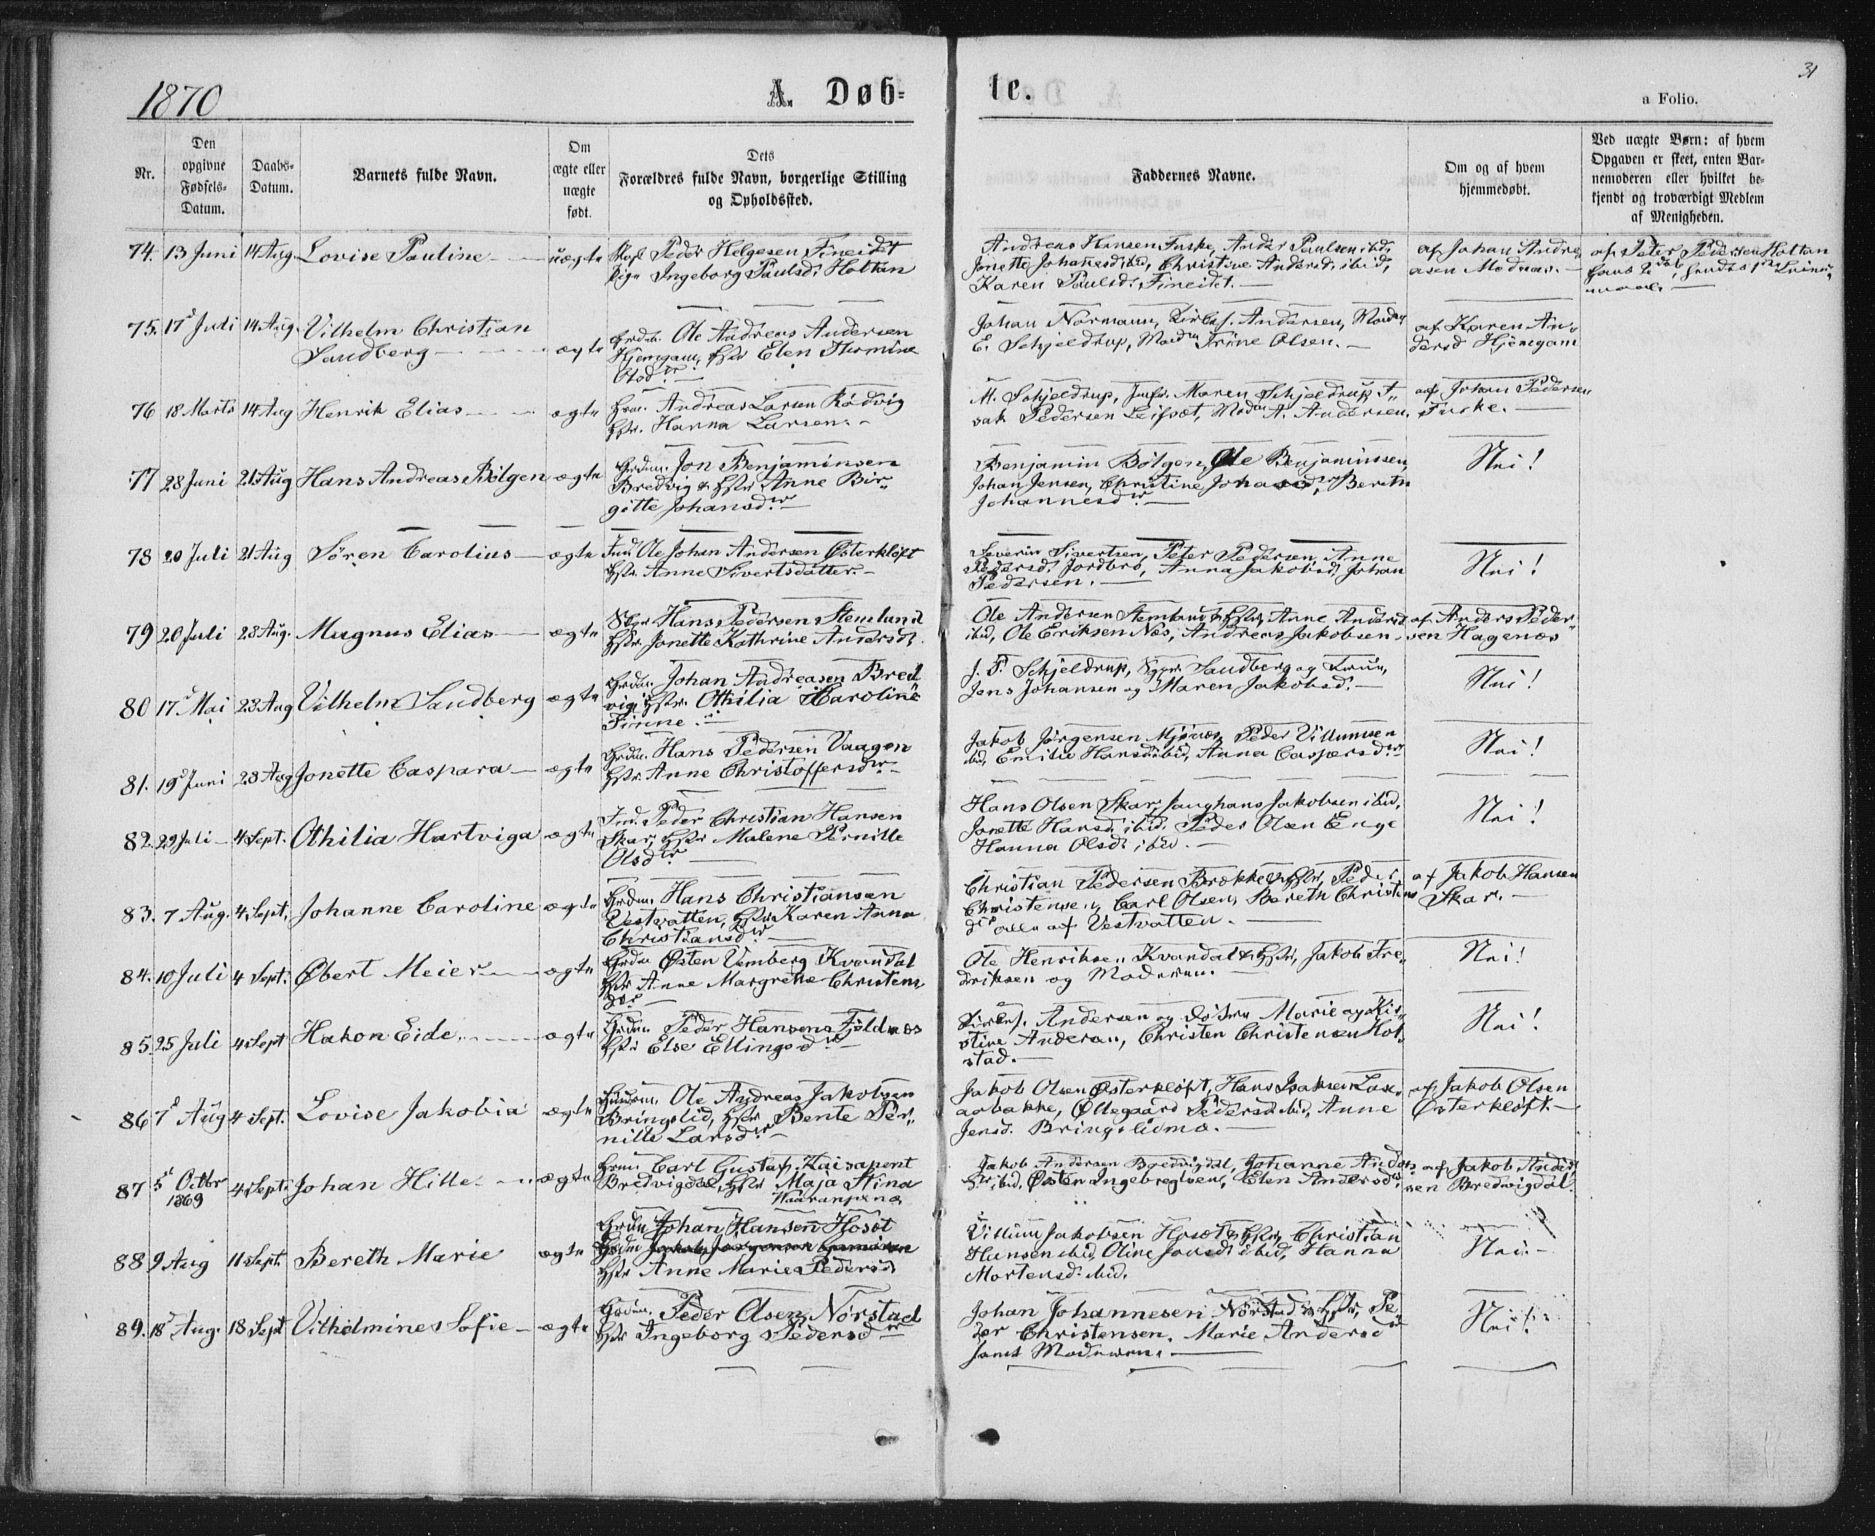 SAT, Ministerialprotokoller, klokkerbøker og fødselsregistre - Nordland, 852/L0739: Ministerialbok nr. 852A09, 1866-1877, s. 31